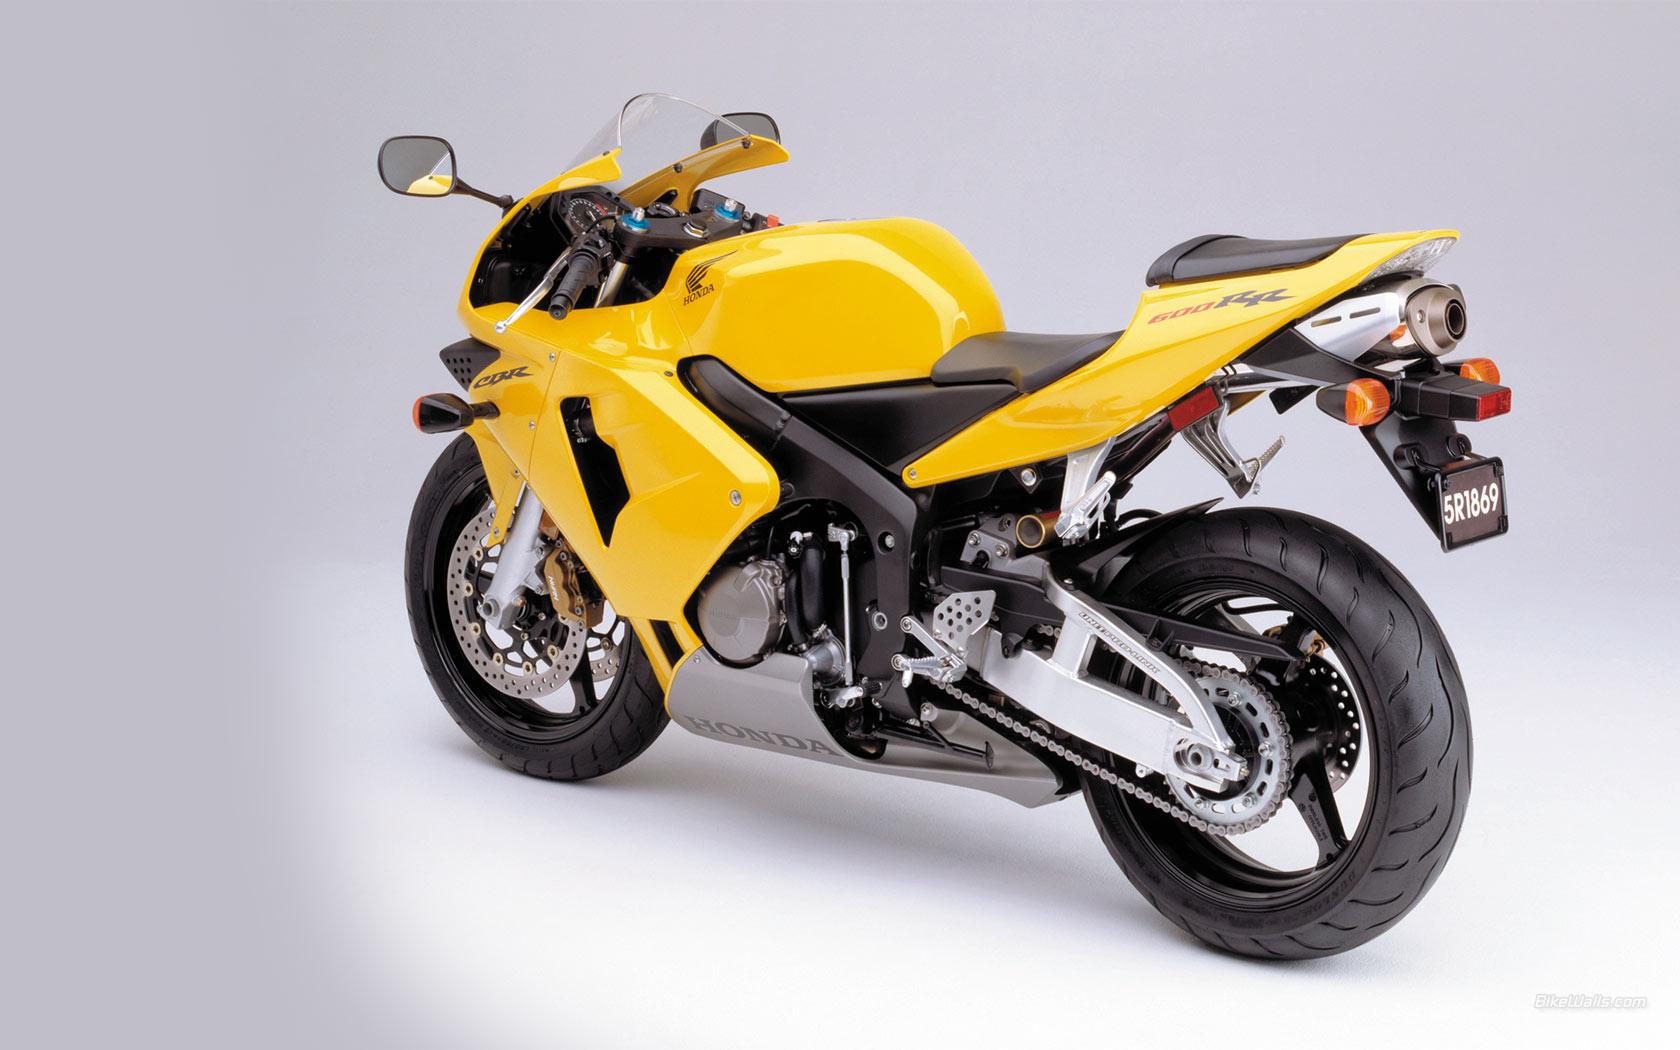 Honda Cbr600rr 1680x1050 C1064 Tapety Na Pulpit